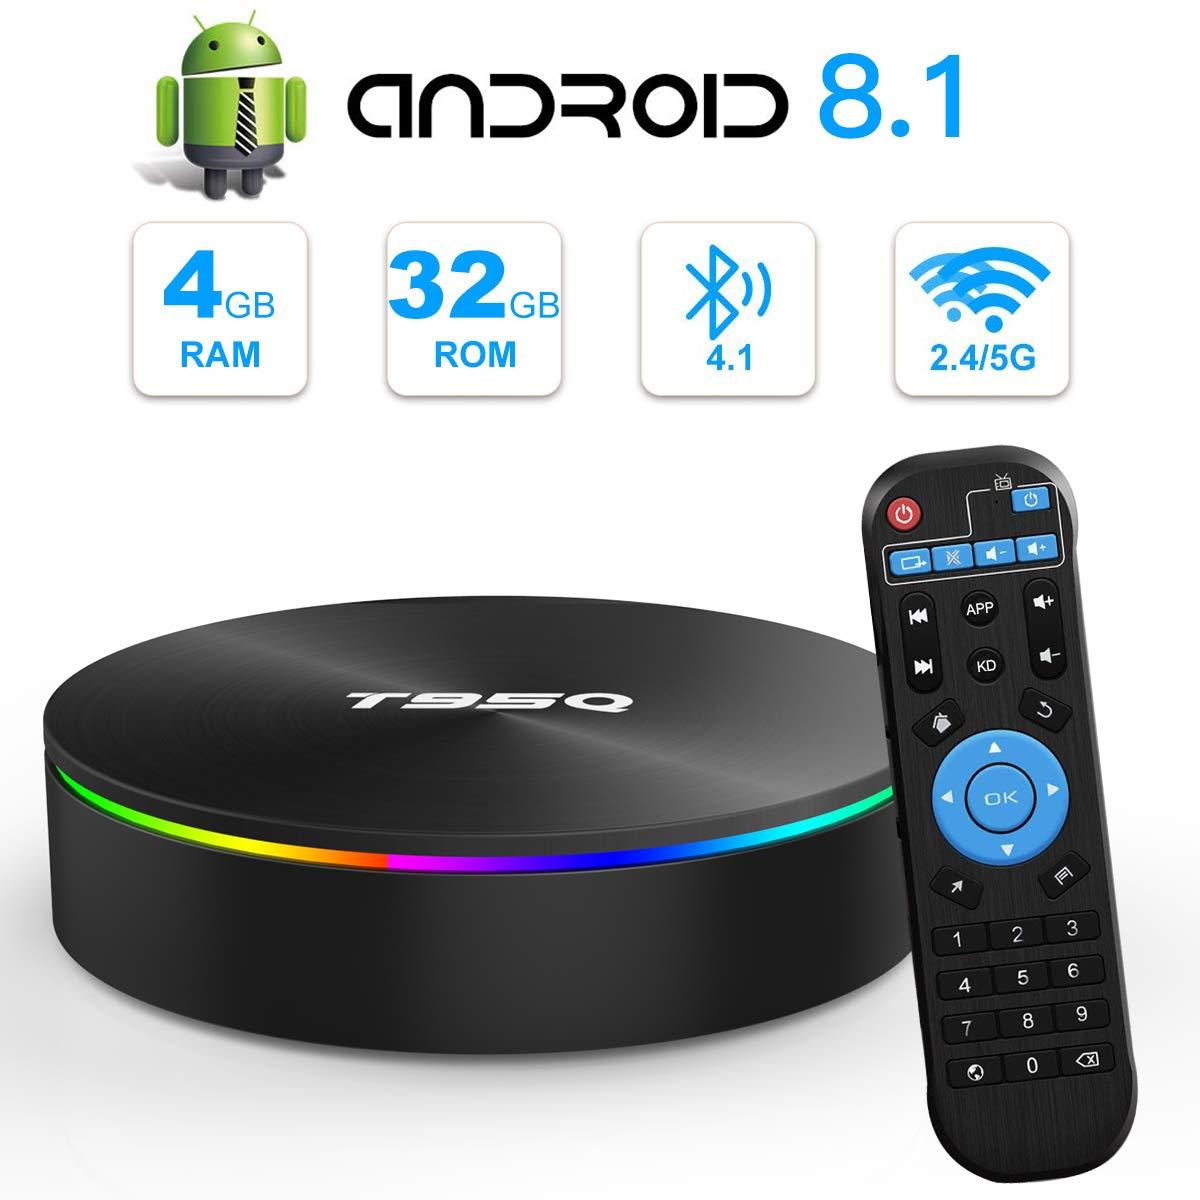 Android 8.1 TV Box, T95Q TV Box 4GB RAM 32GB ROM Amlogic S905X2 Quad-Core Cortex-A53 Bluetooth 4.1 Resolución 4K H.265 2.4GHz y 5GHz Dual Band WiFi HDMI 2.1 Smart Box: Amazon.es: Electrónica